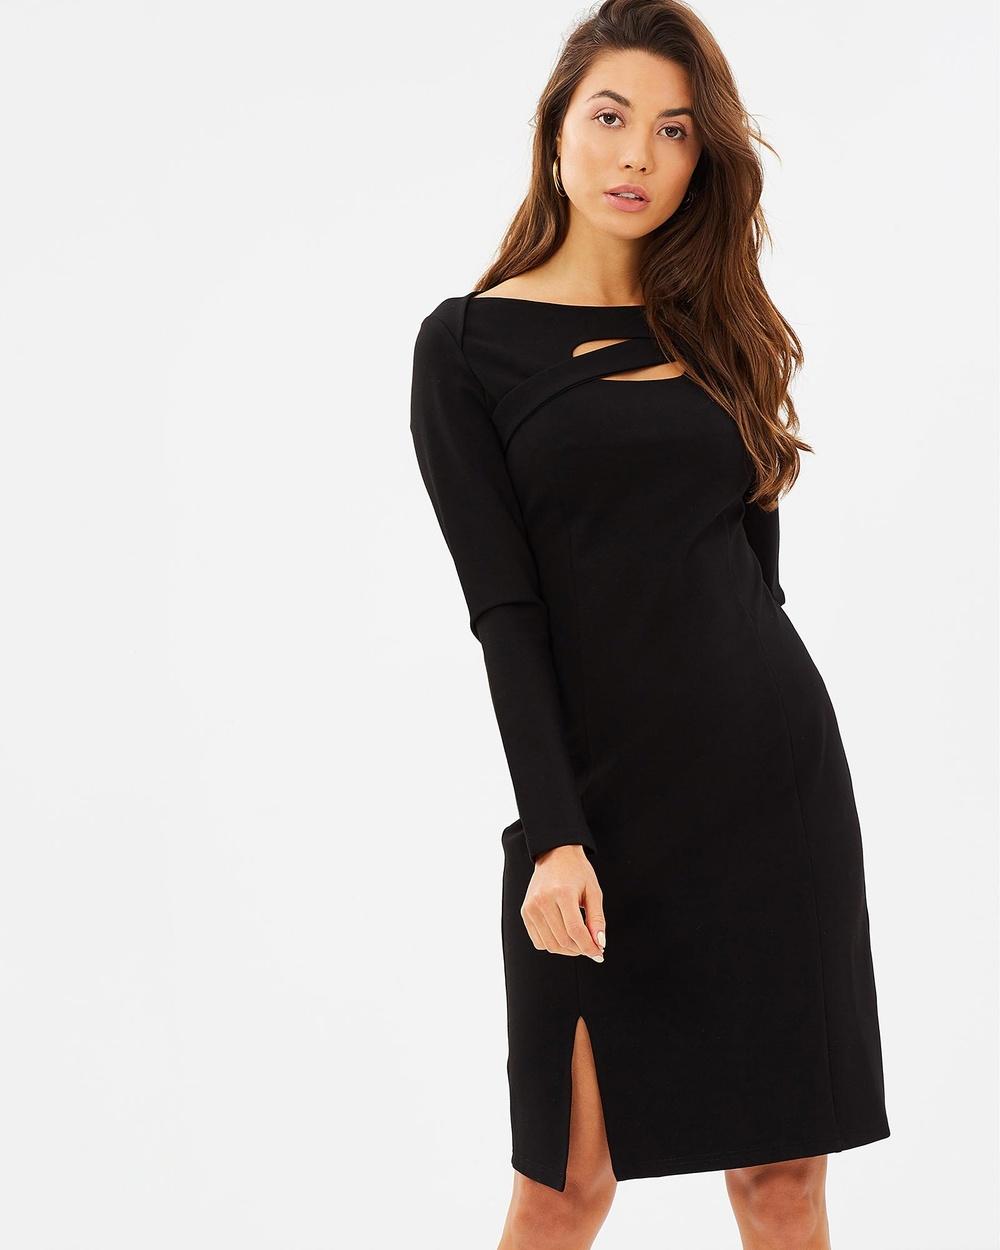 Privilege Cosmopolitan Cutout Dress Dresses Black Cosmopolitan Cutout Dress